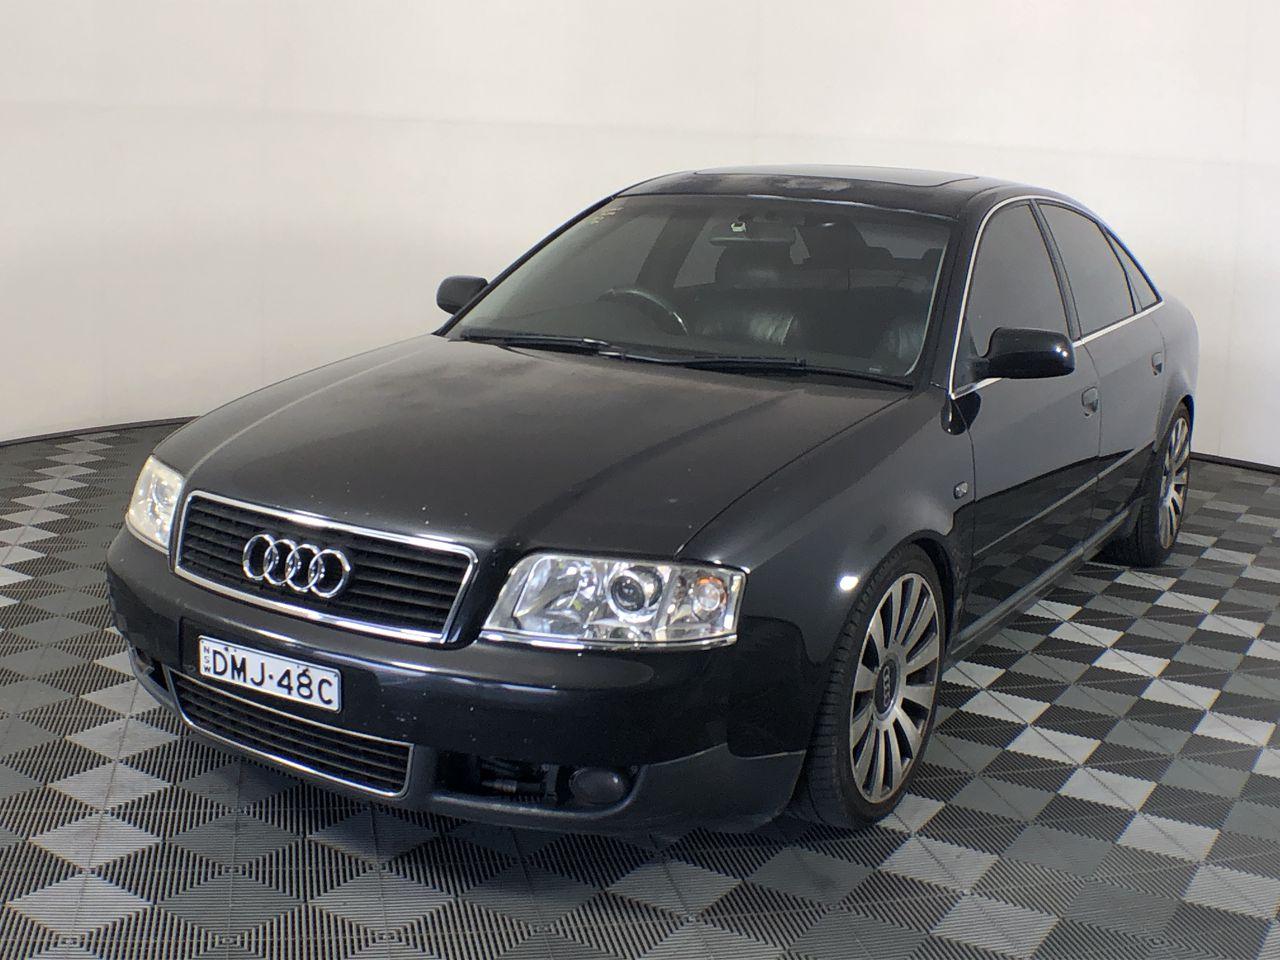 2002 Audi A6 3.0 V6 QUATTRO C6 Automatic Sedan